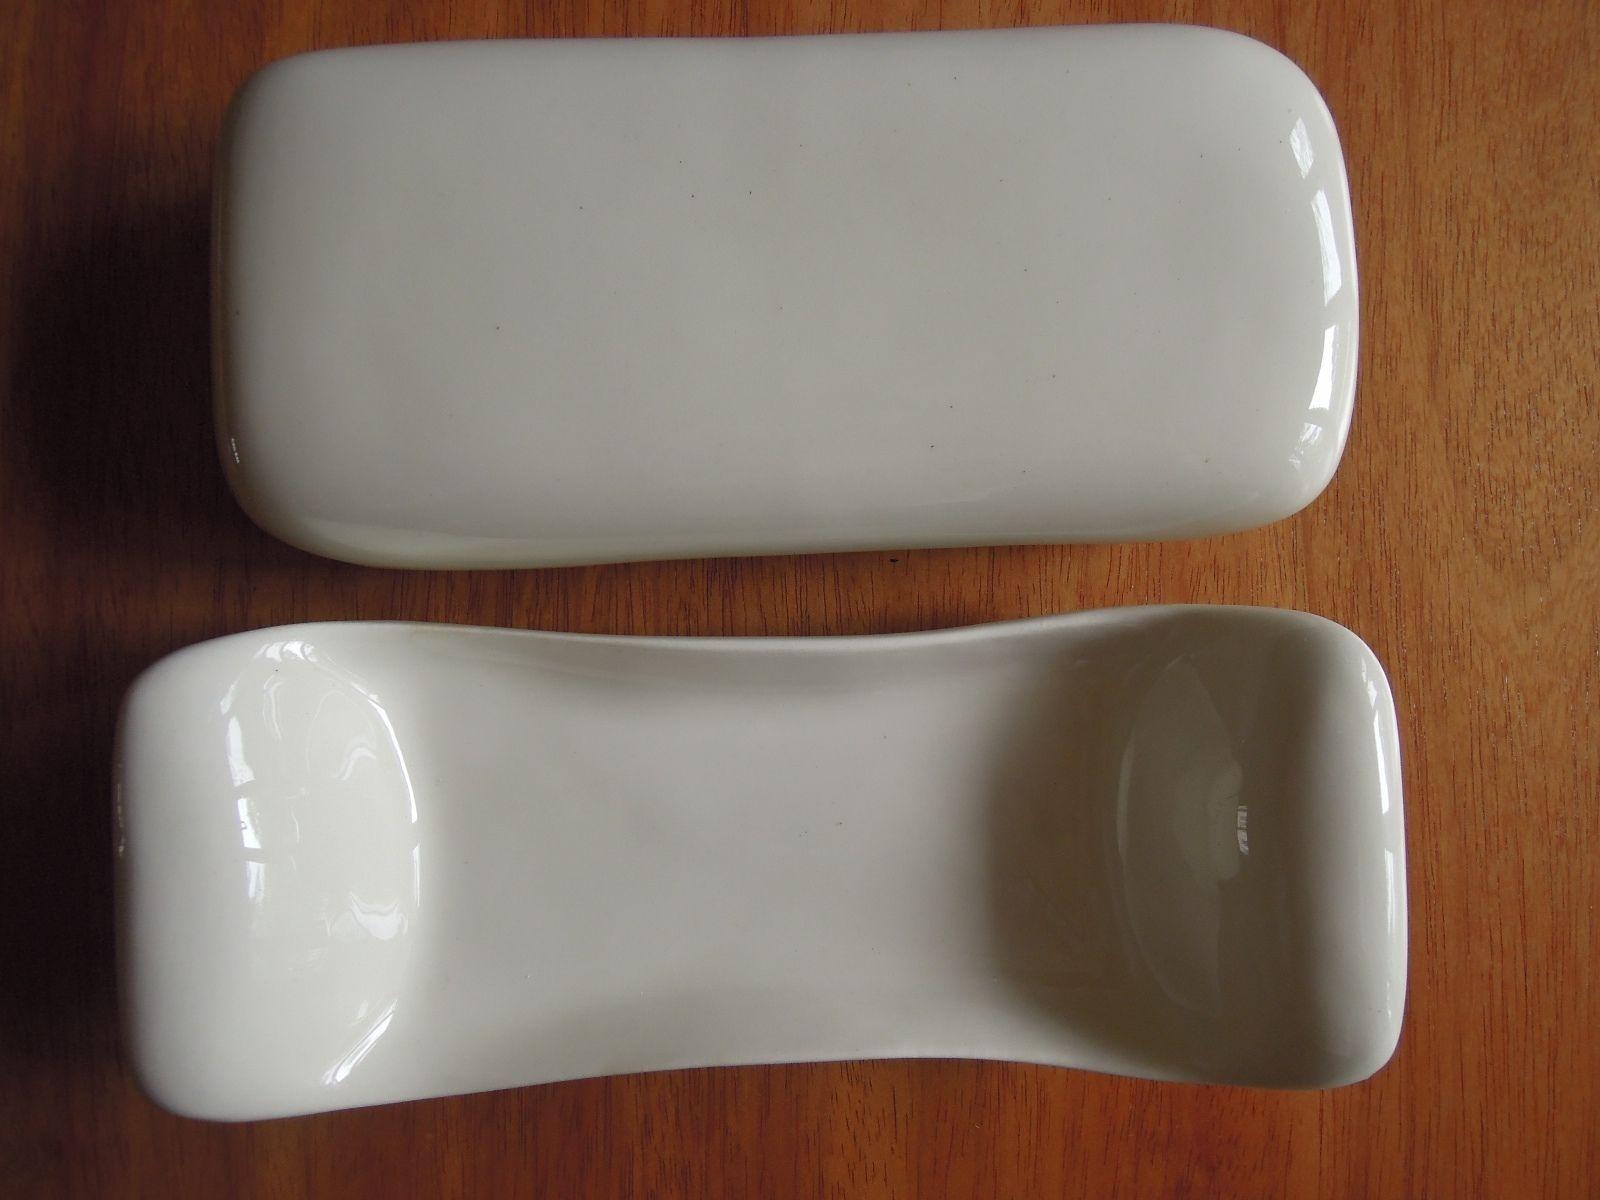 russel wright american modern steubenville white butter dish with  - russel wright american modern steubenville white butter dish with lid  ebay